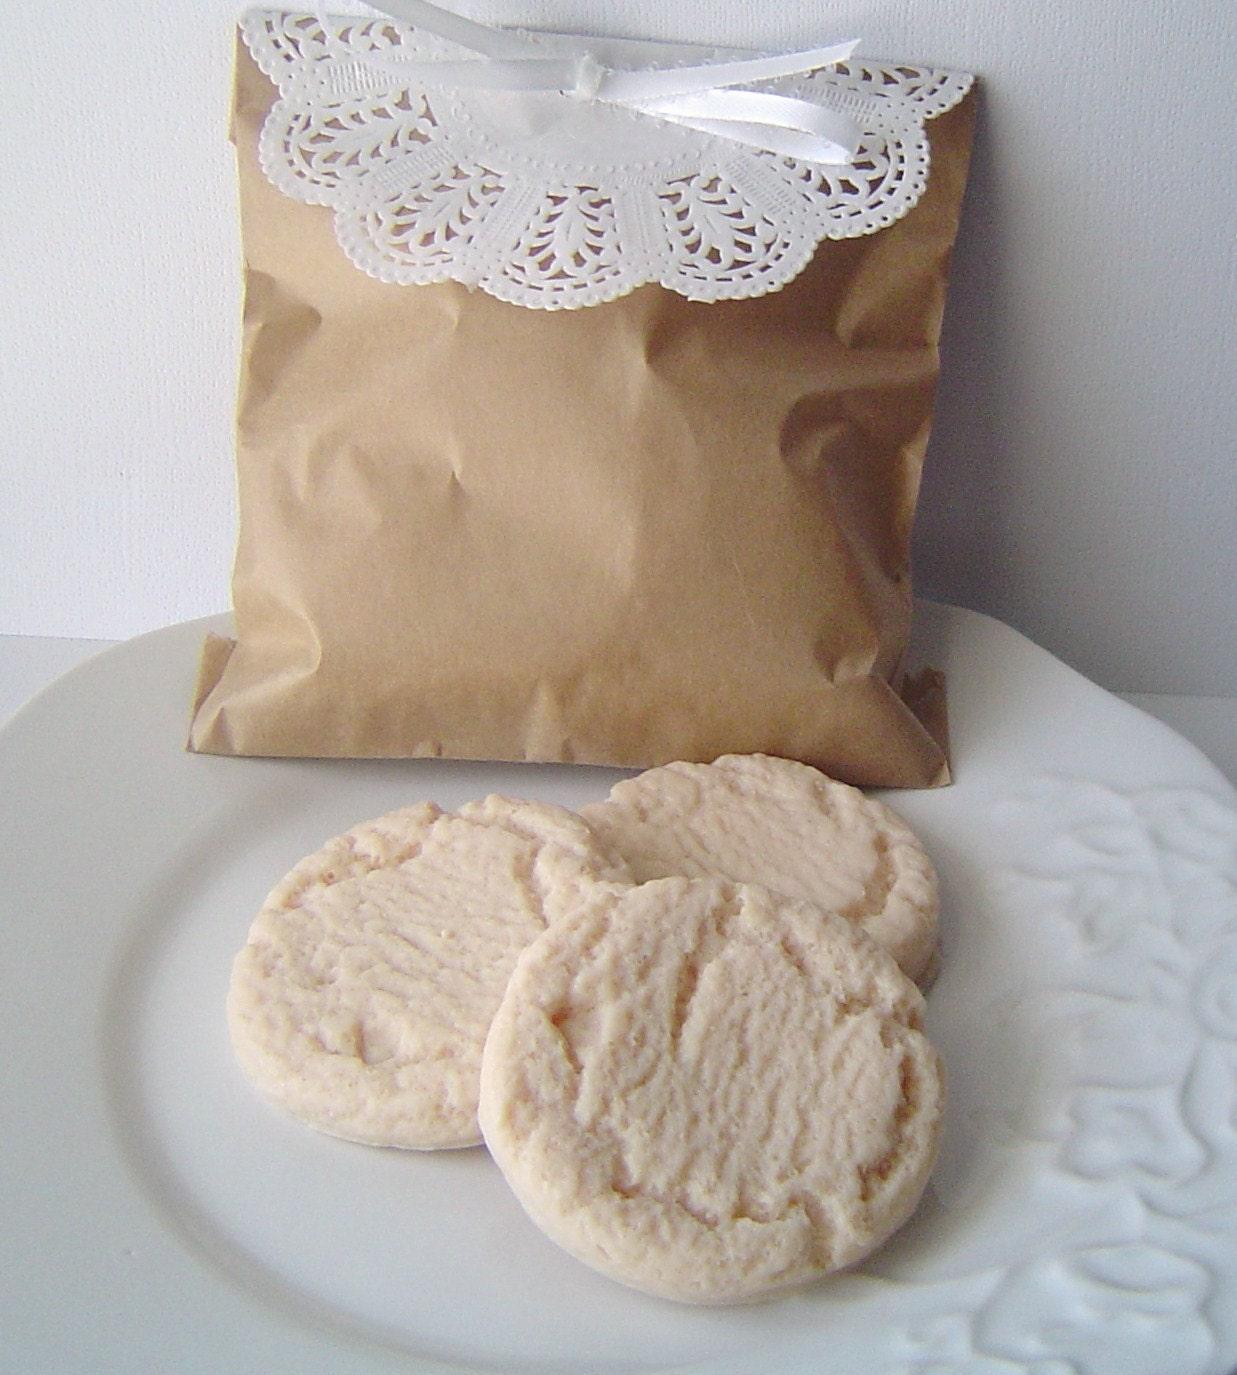 Grandma's Sugar Cookie Soap Set-Goat's Milk Soap